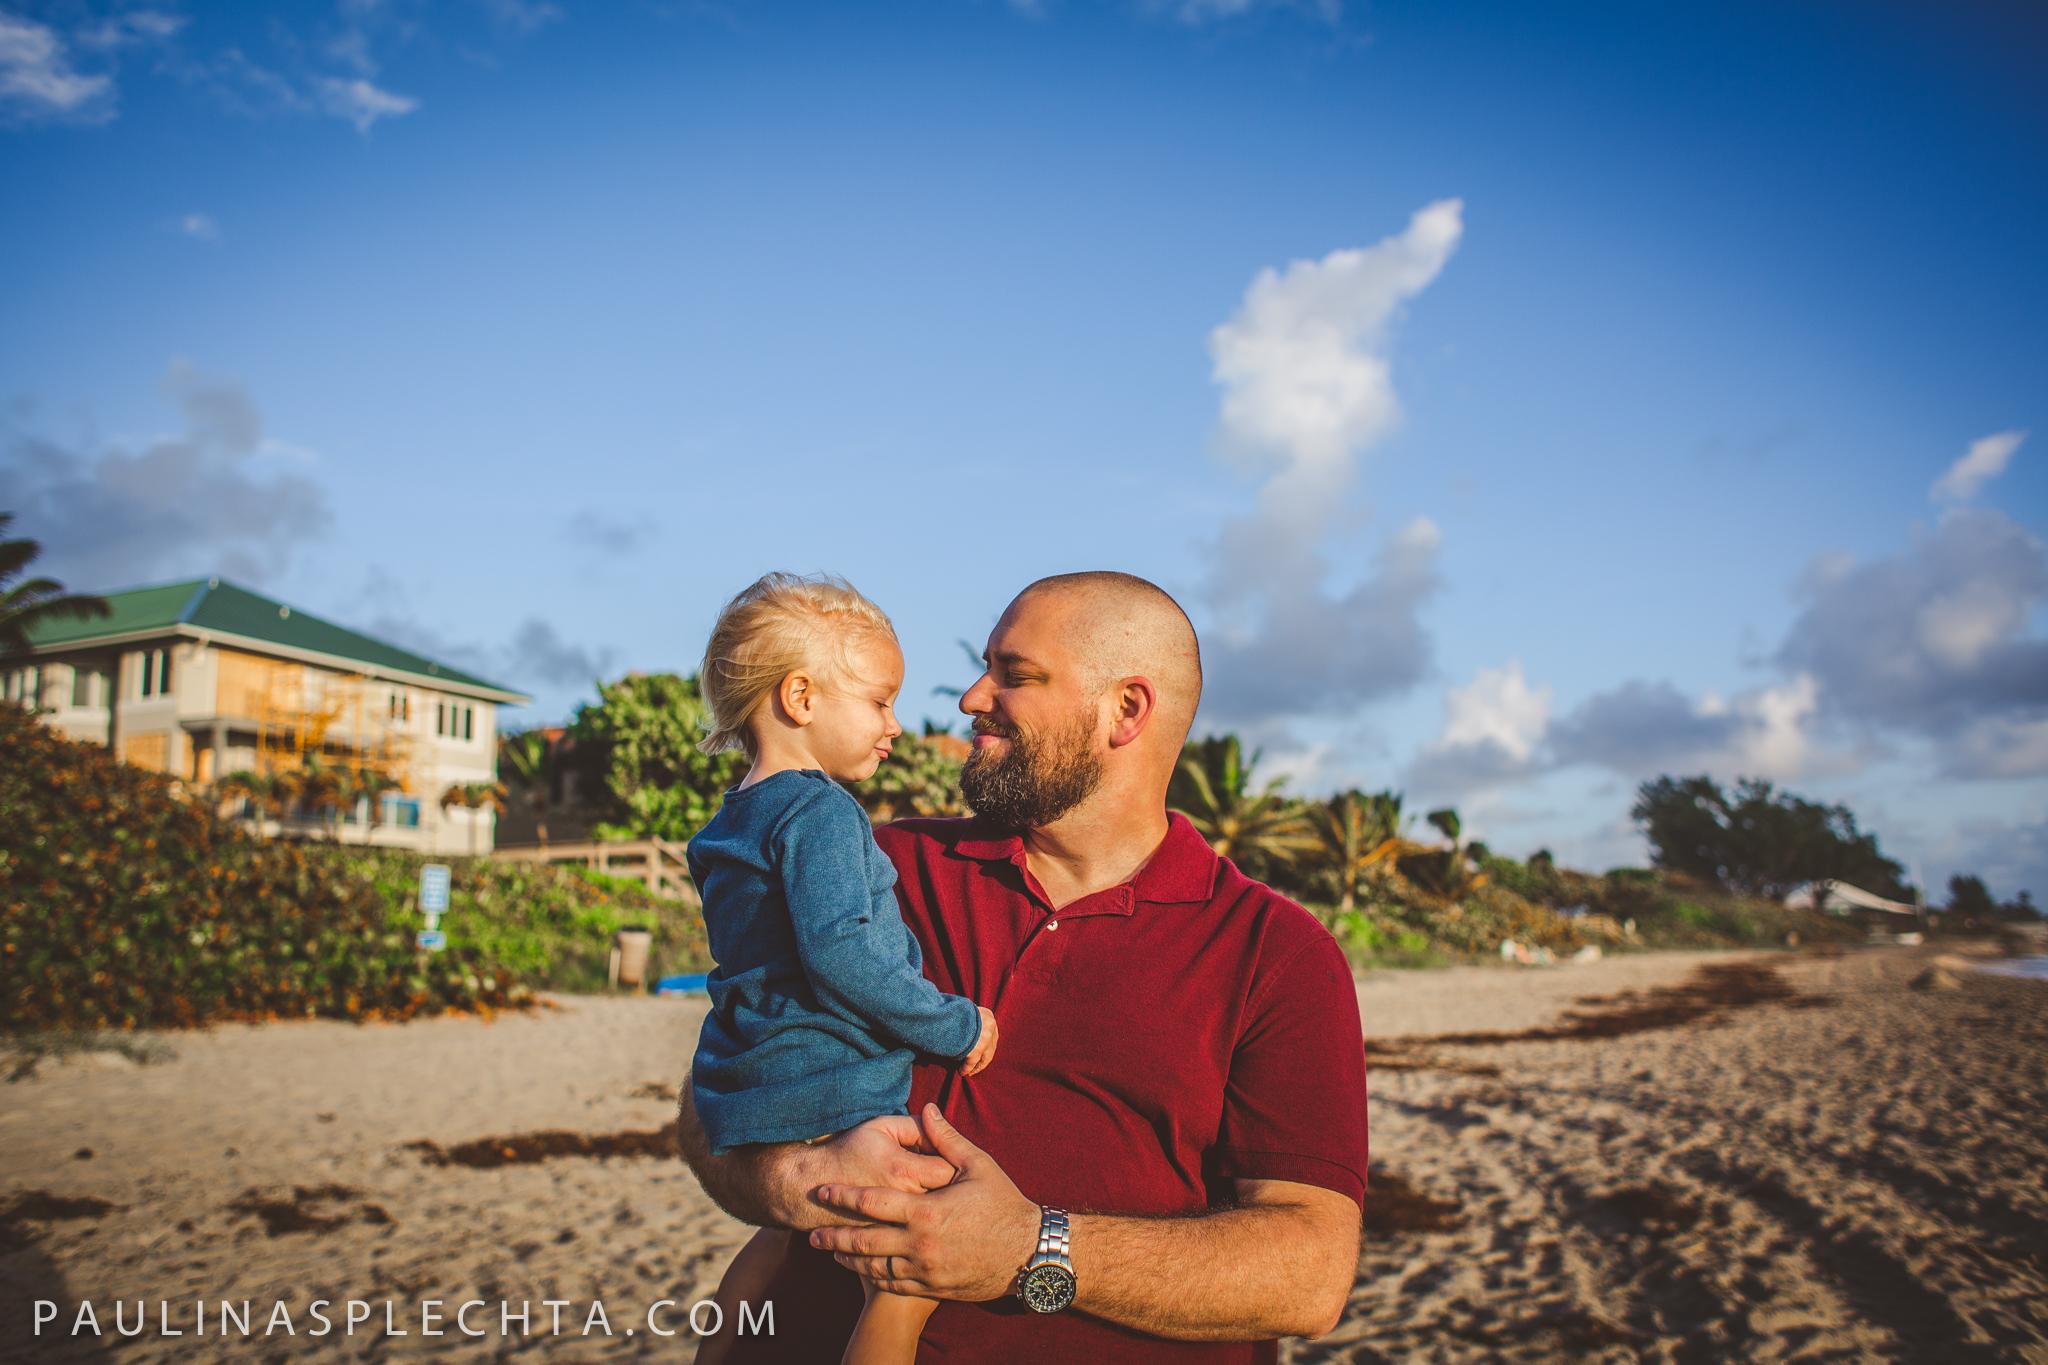 Family Photographer South Florida Pompano Broward Palm Beach Babies Baby Newborn Breastfeeding Birth Photograpy Beach Home Documentary Session-106.jpg